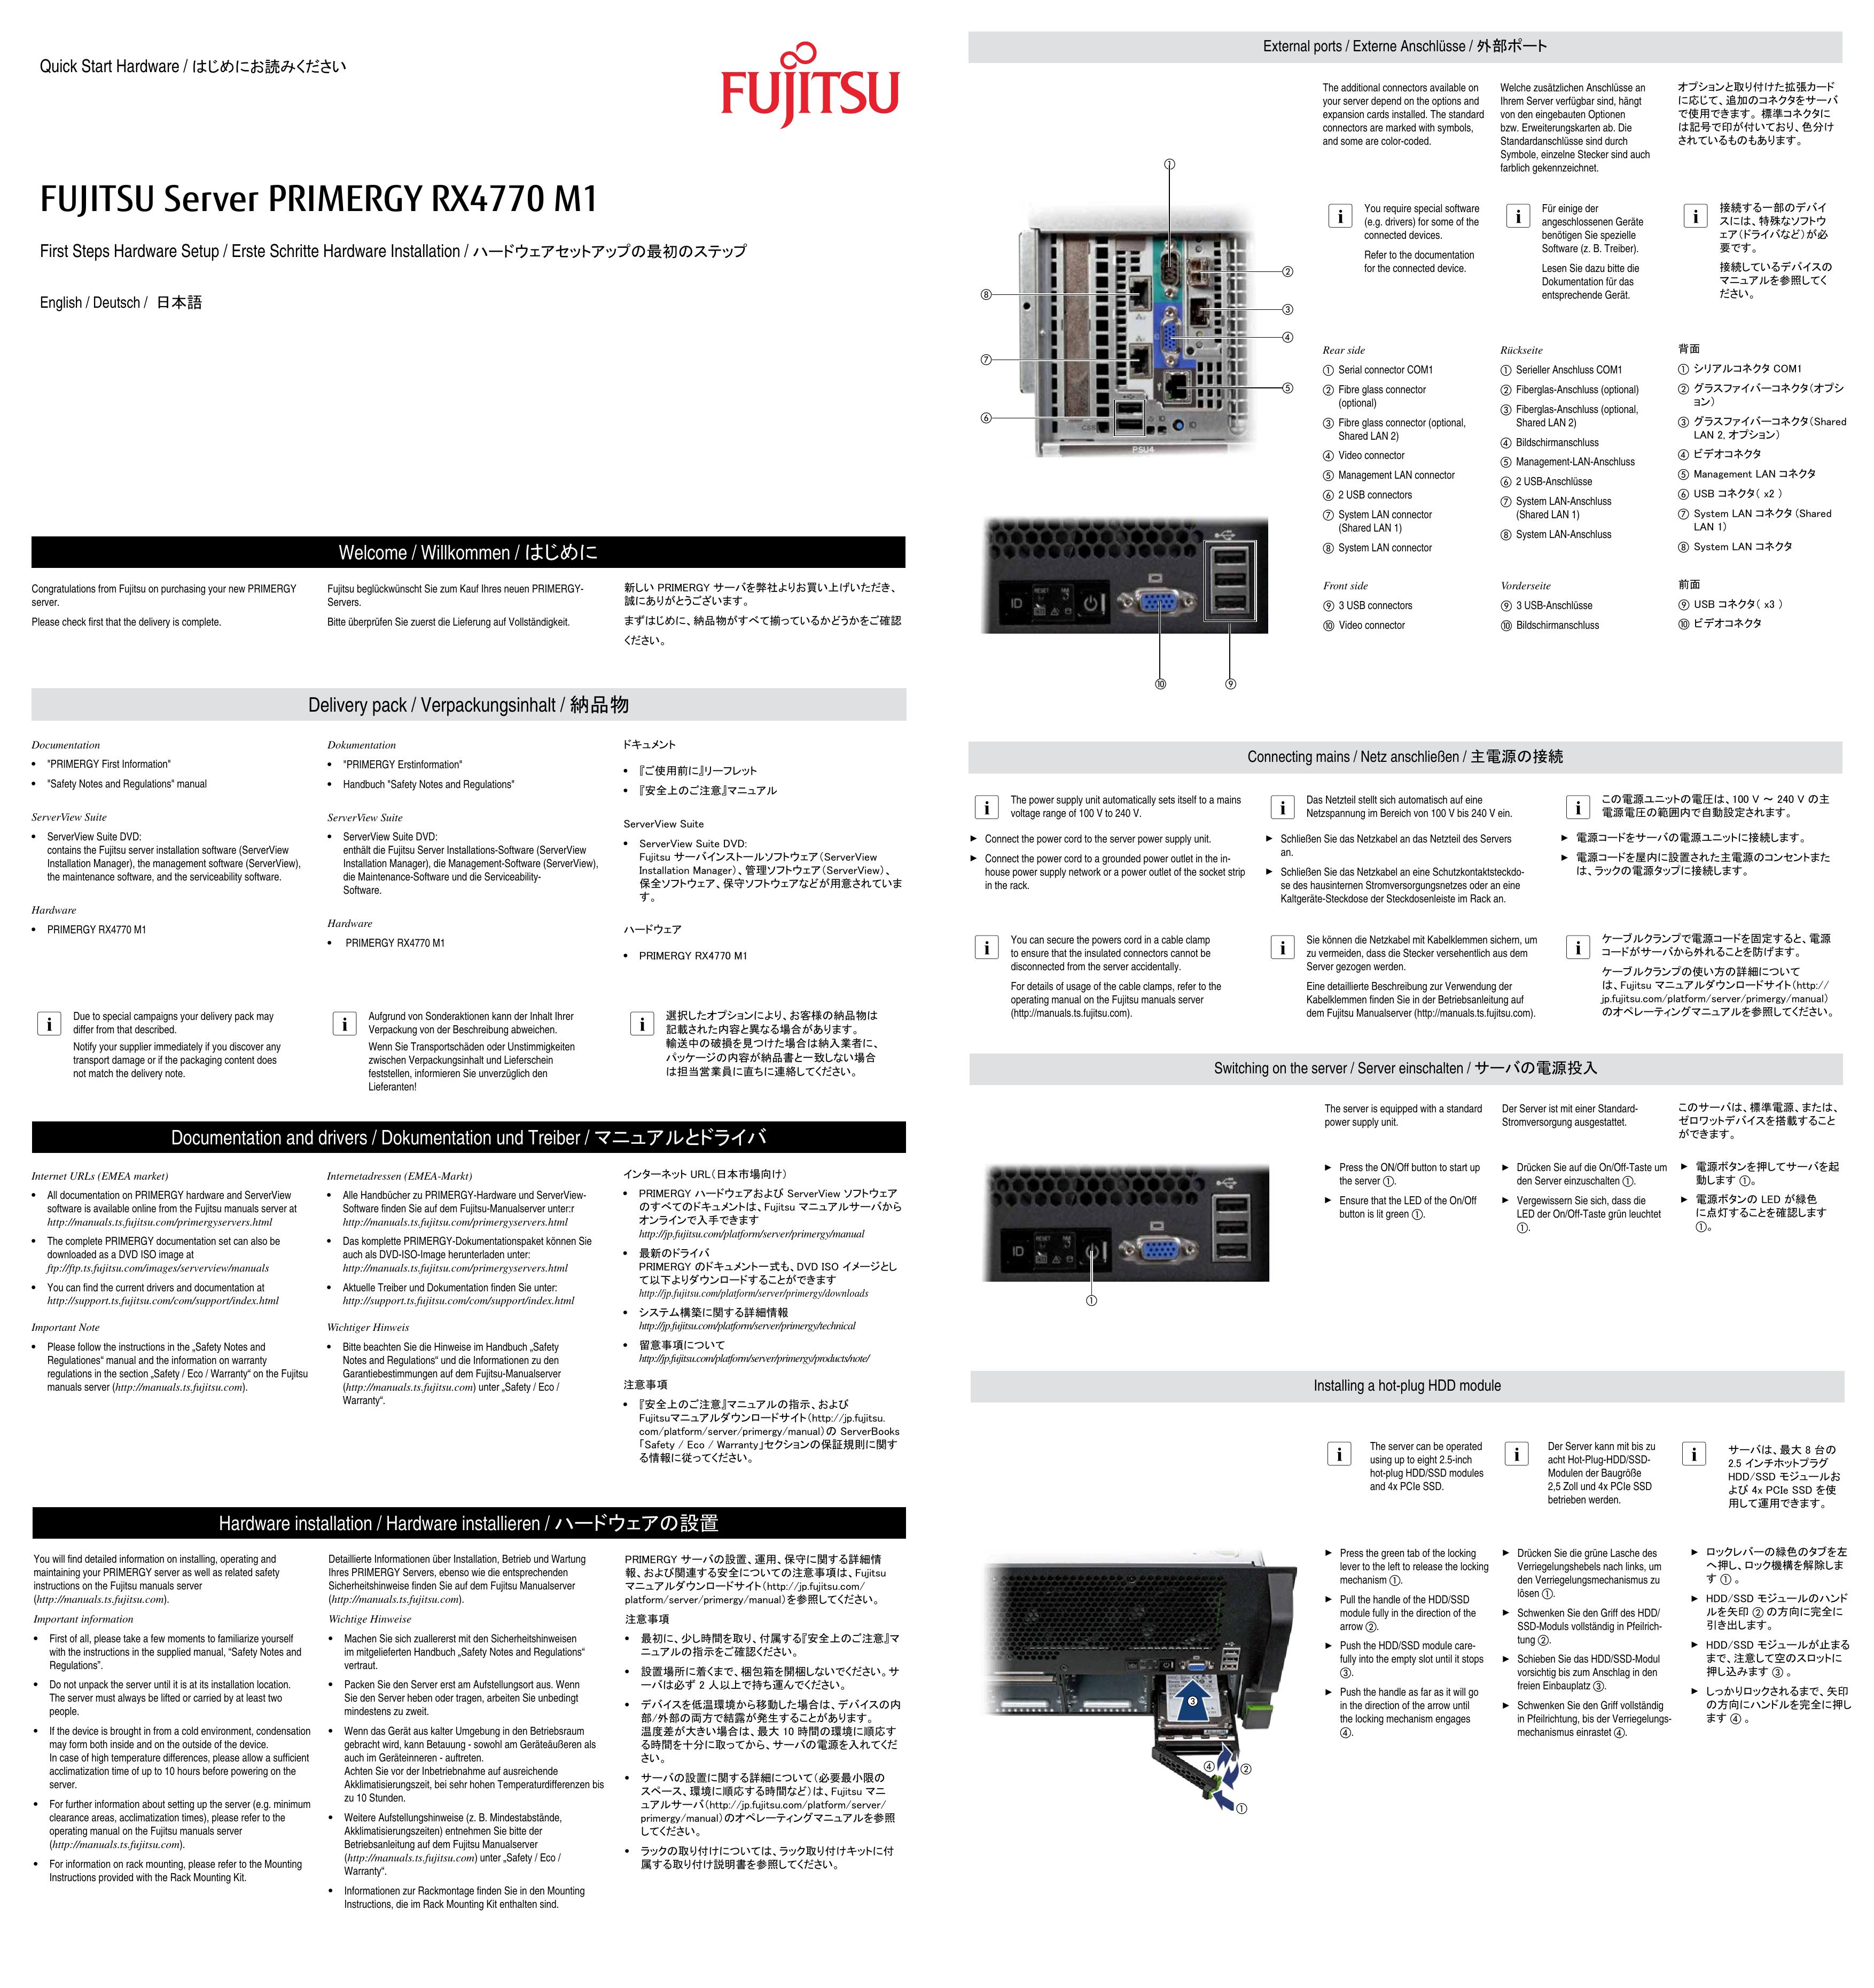 Fujitsu Server Primergy Rx4770 M1 Manualzz